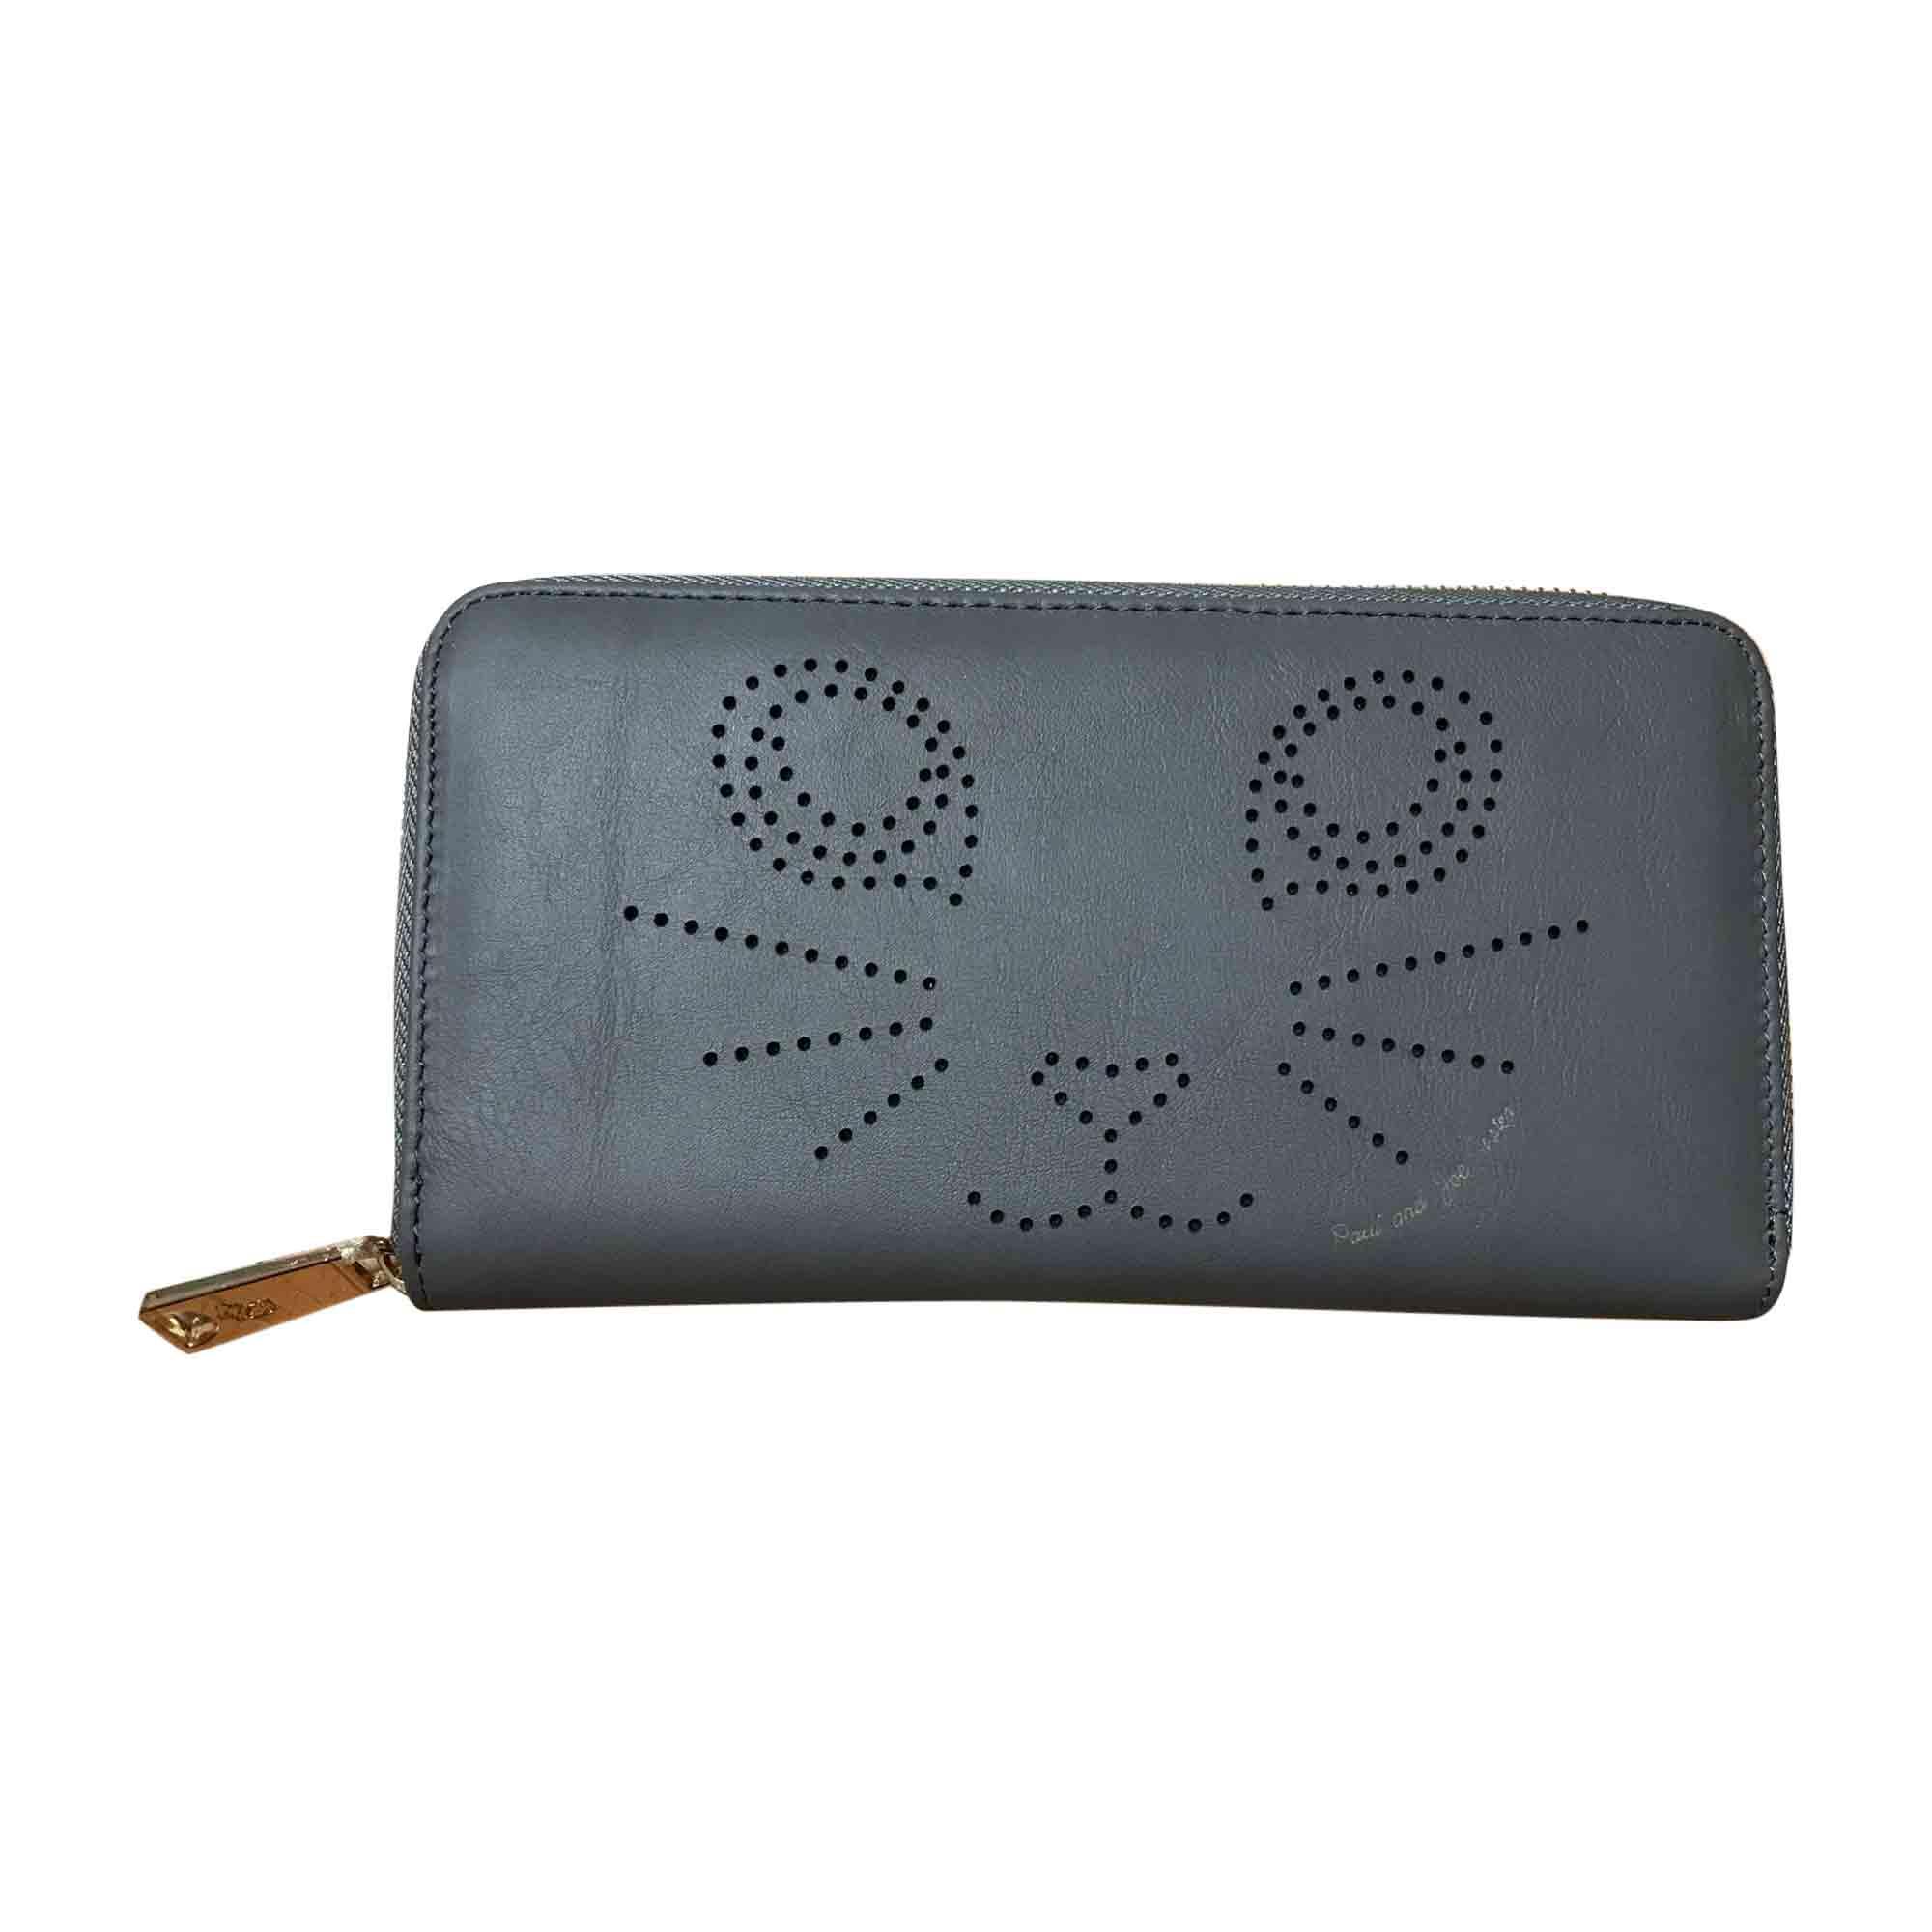 Portefeuille PAUL   JOE gris vendu par Dressing de marque - 6395300 948aad34889